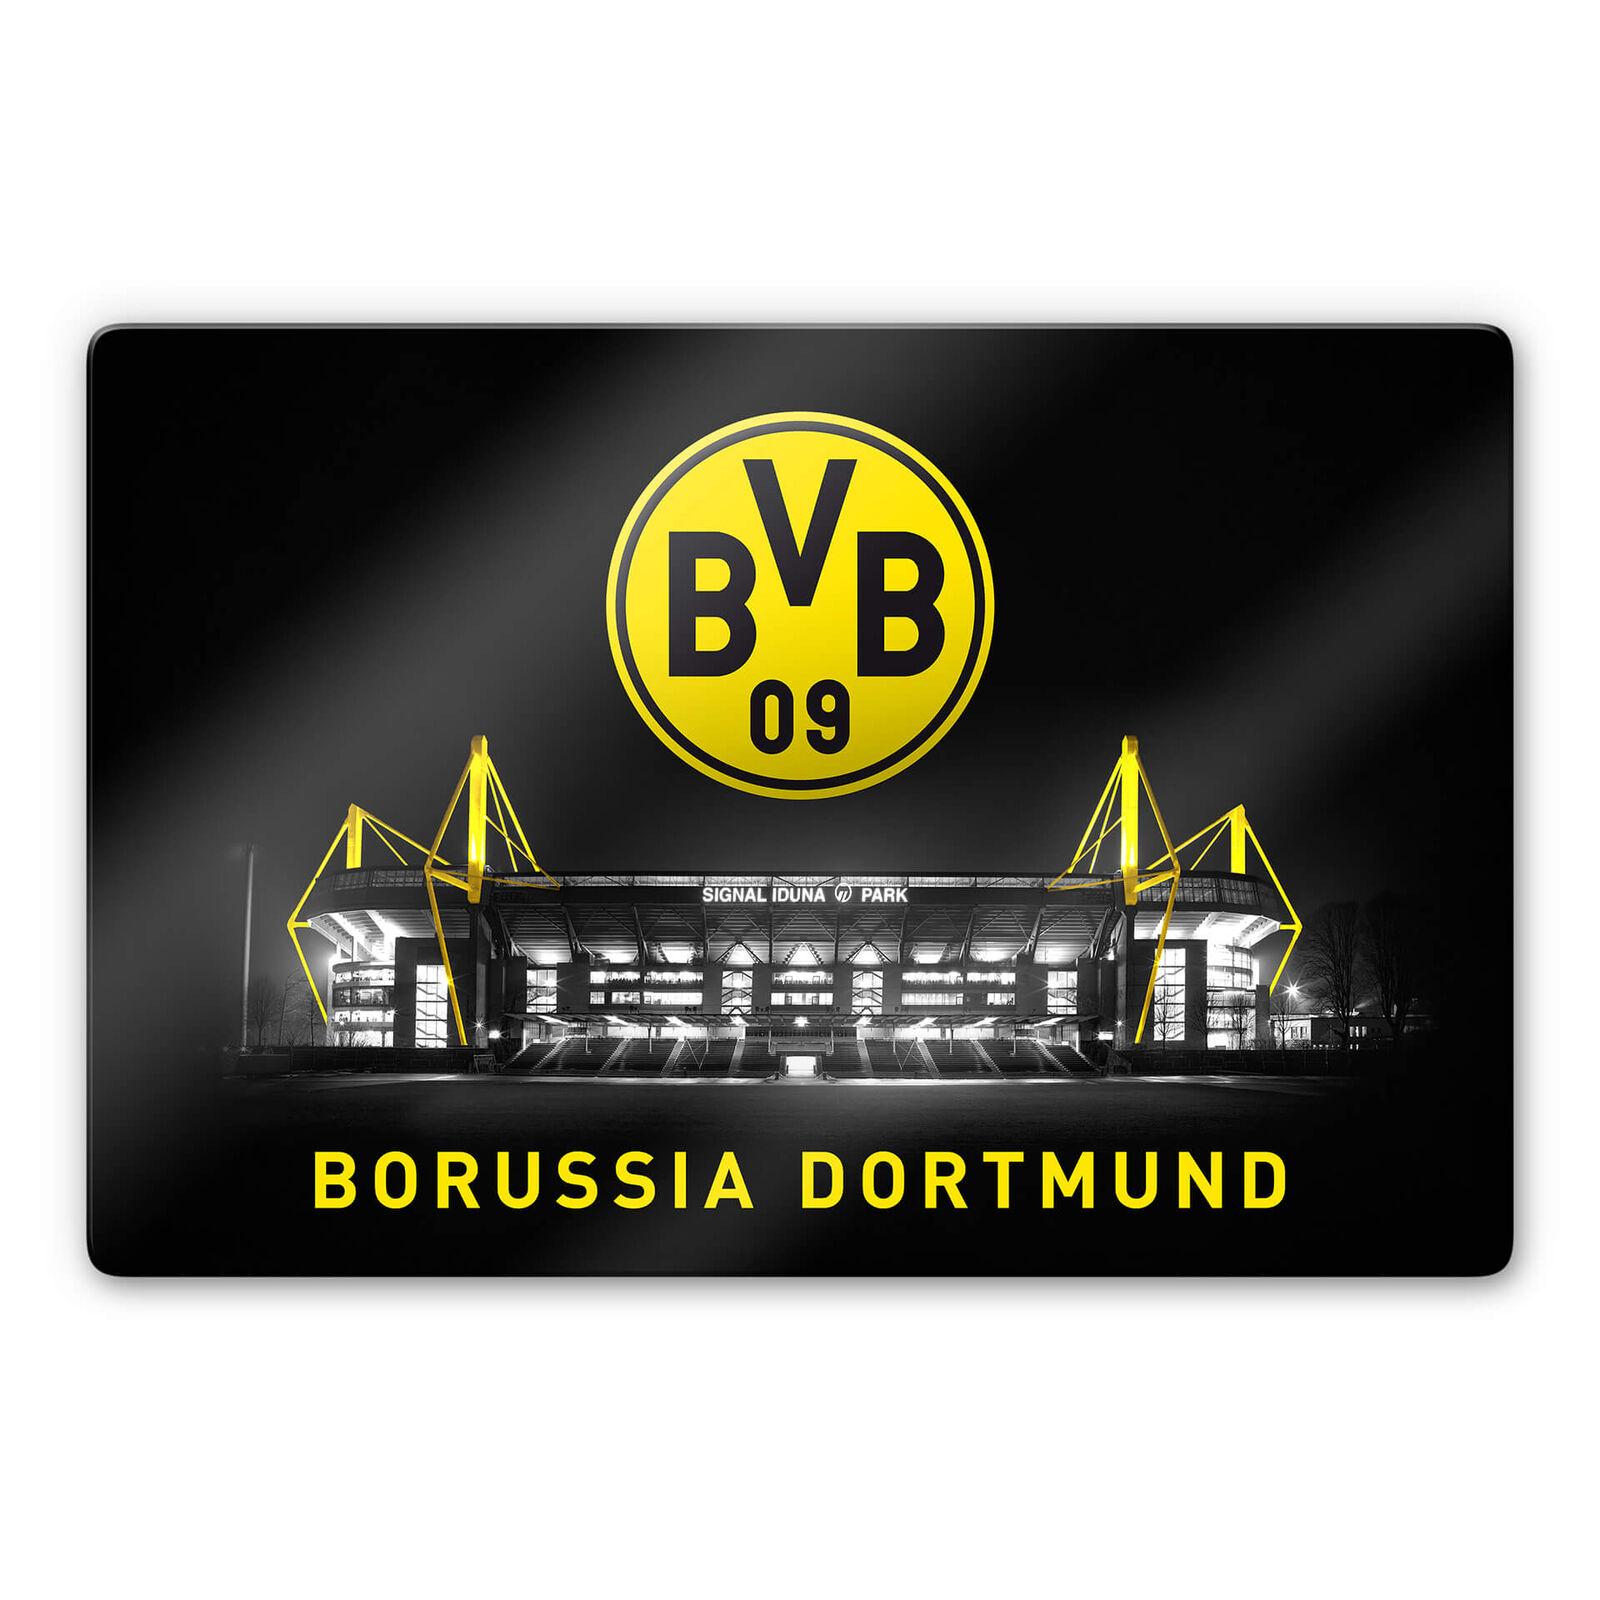 Glasbild BVB - Signal Iduna Park bei Nacht mit mit mit Emblem Borussia Dortmund Fanshop 7e54a0